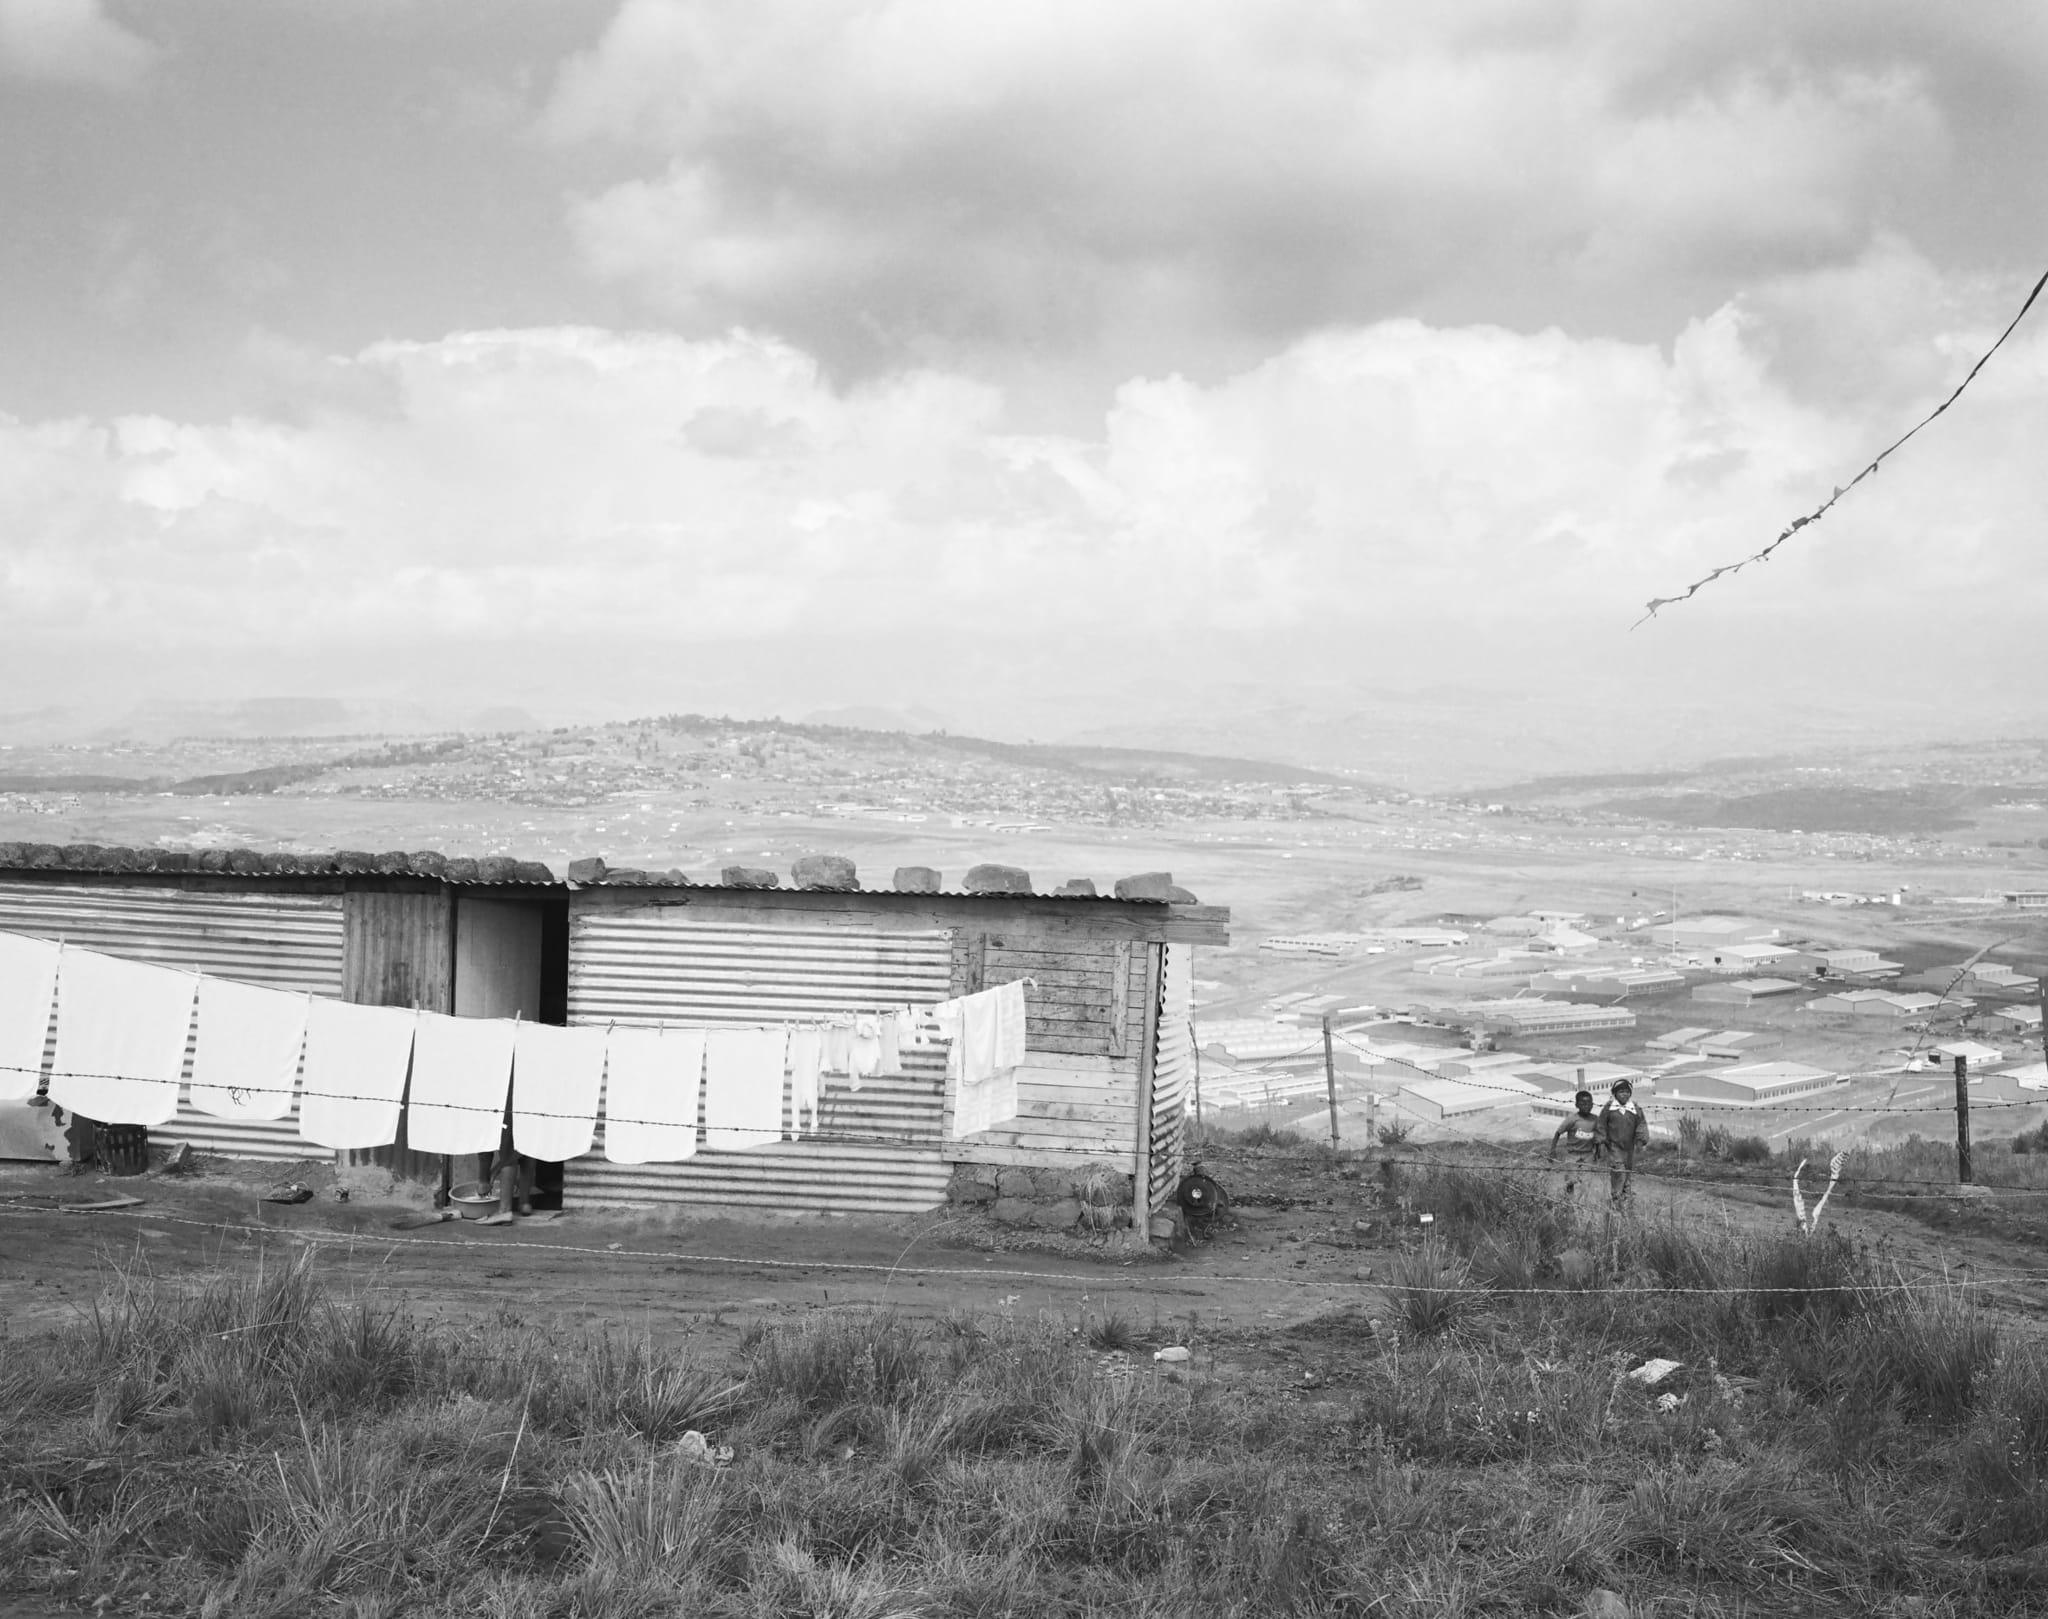 Structures: Kite flying near Phuthaditjhaba, Qwa Qwa. 1 May 1989 by David Goldblatt